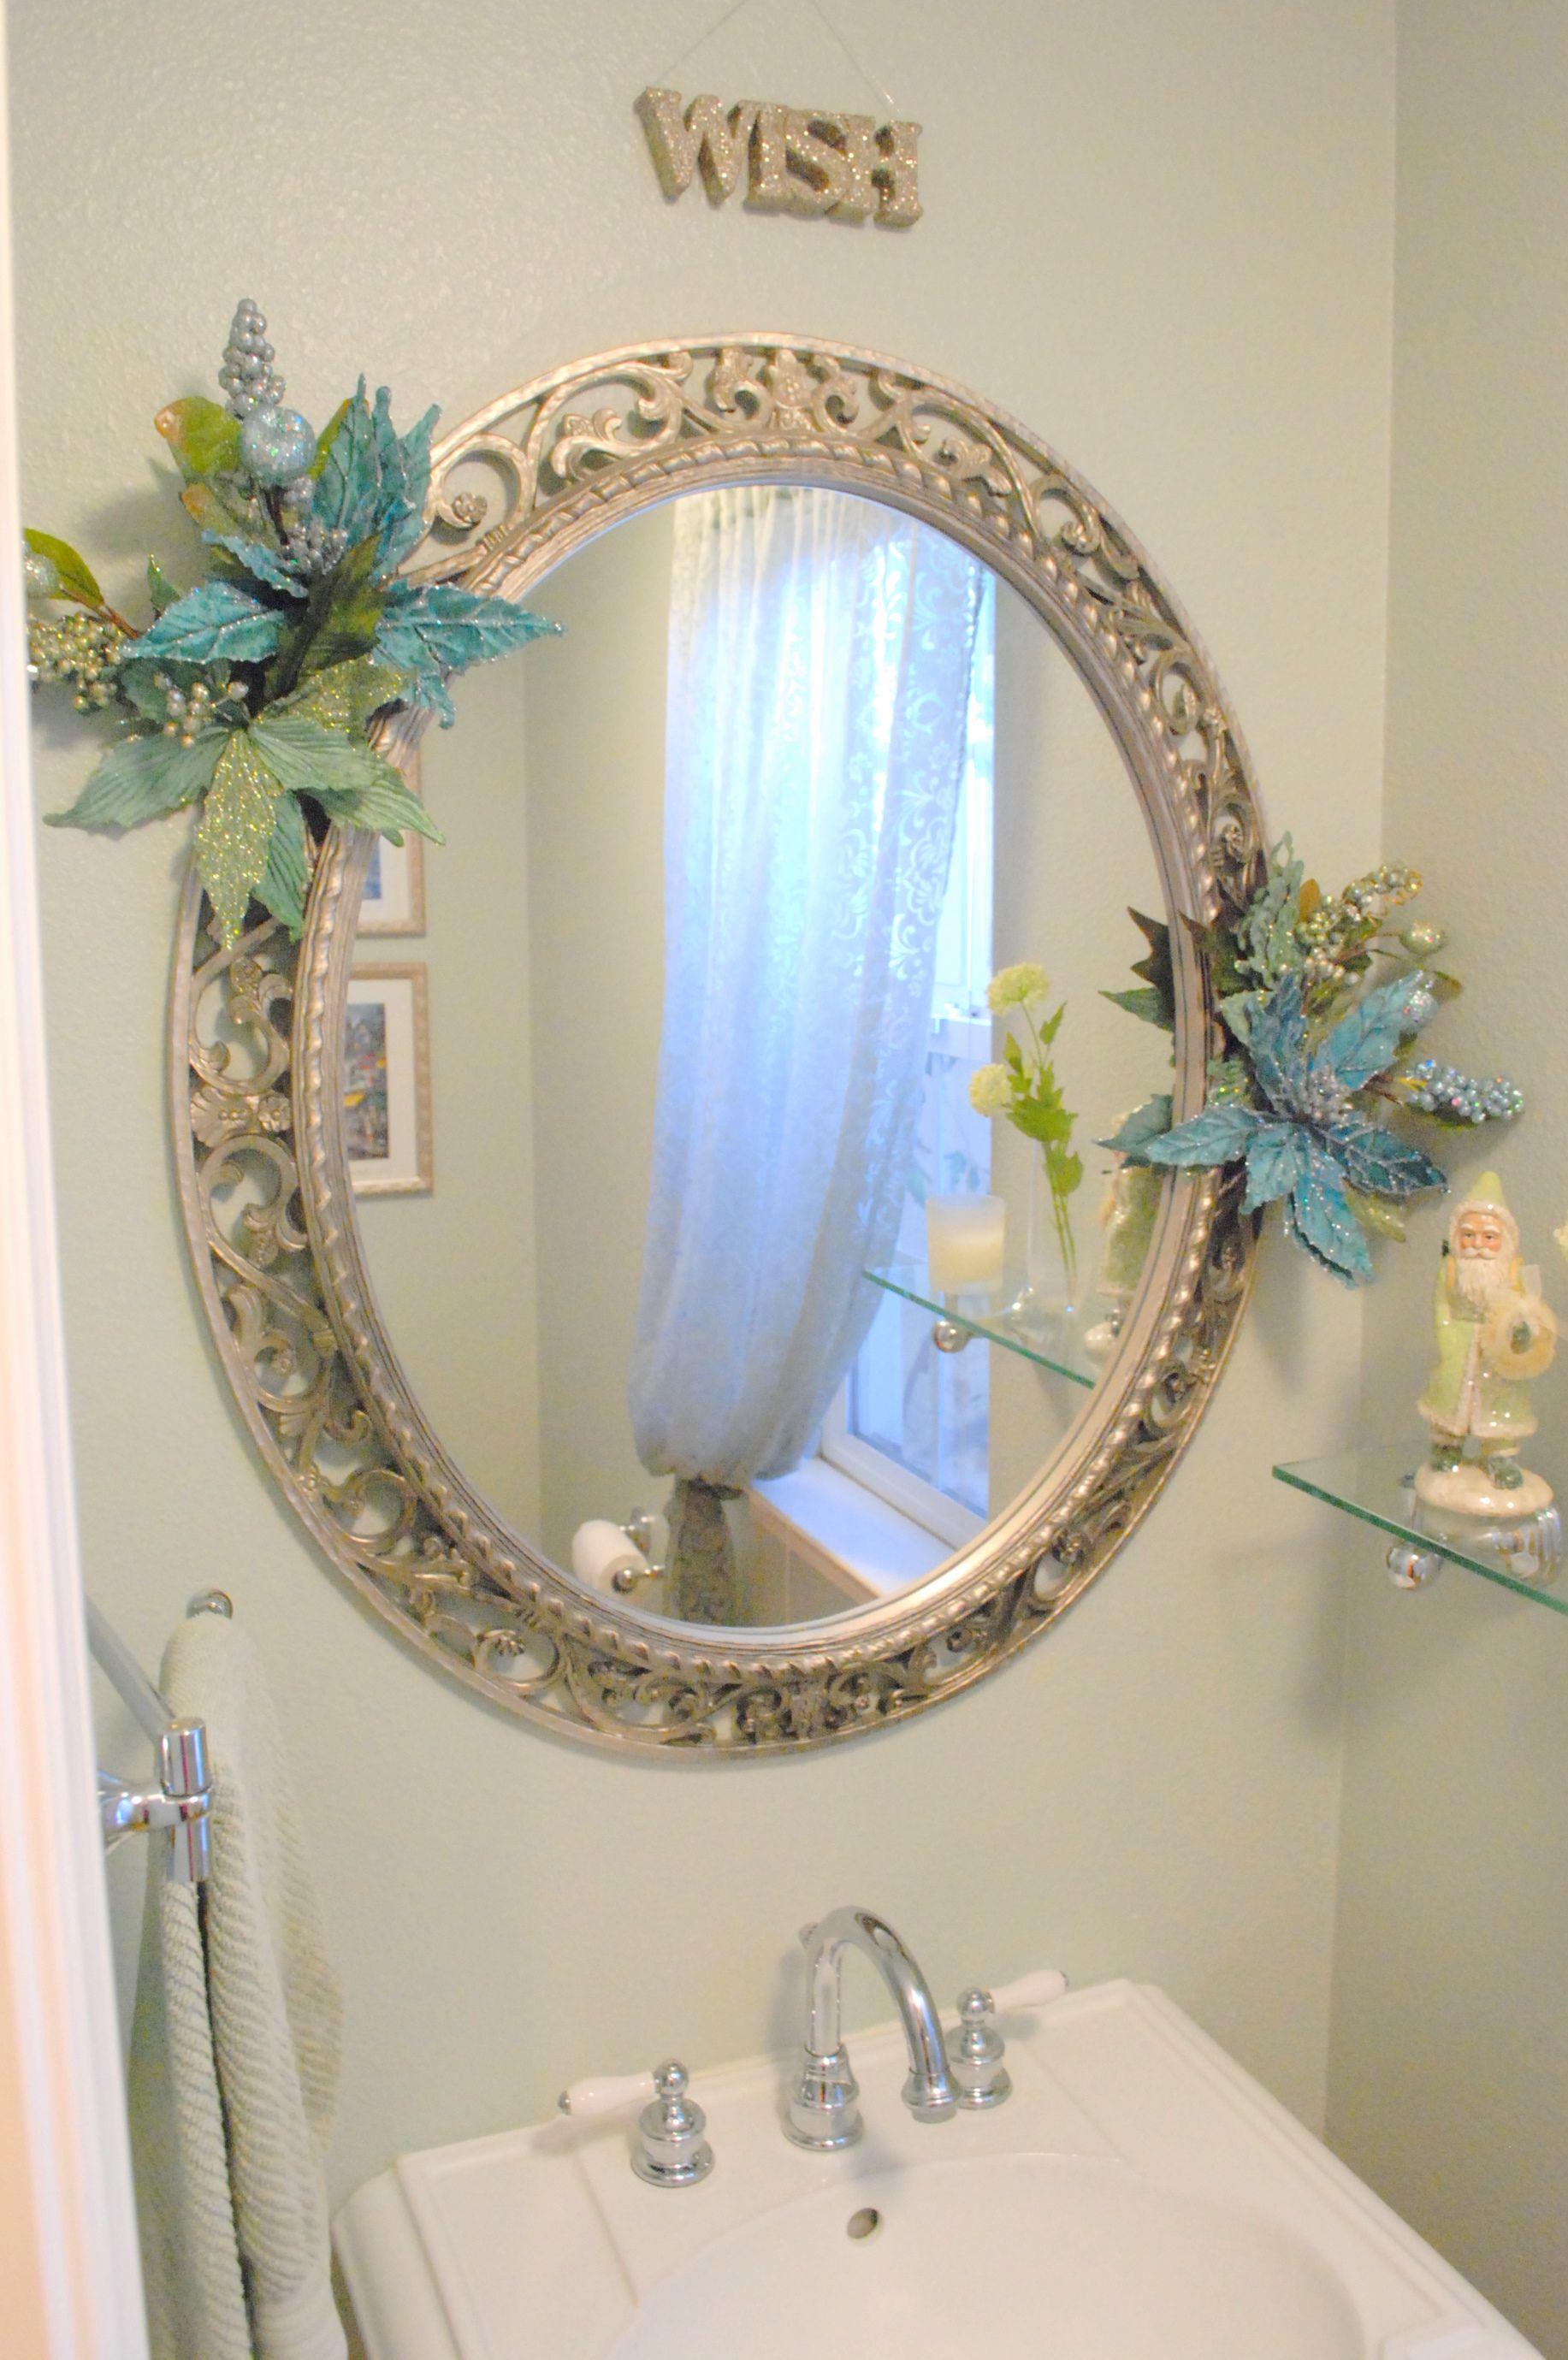 Holiday bathroom decorating ideas - Decorating Your Bathroom For Christmas